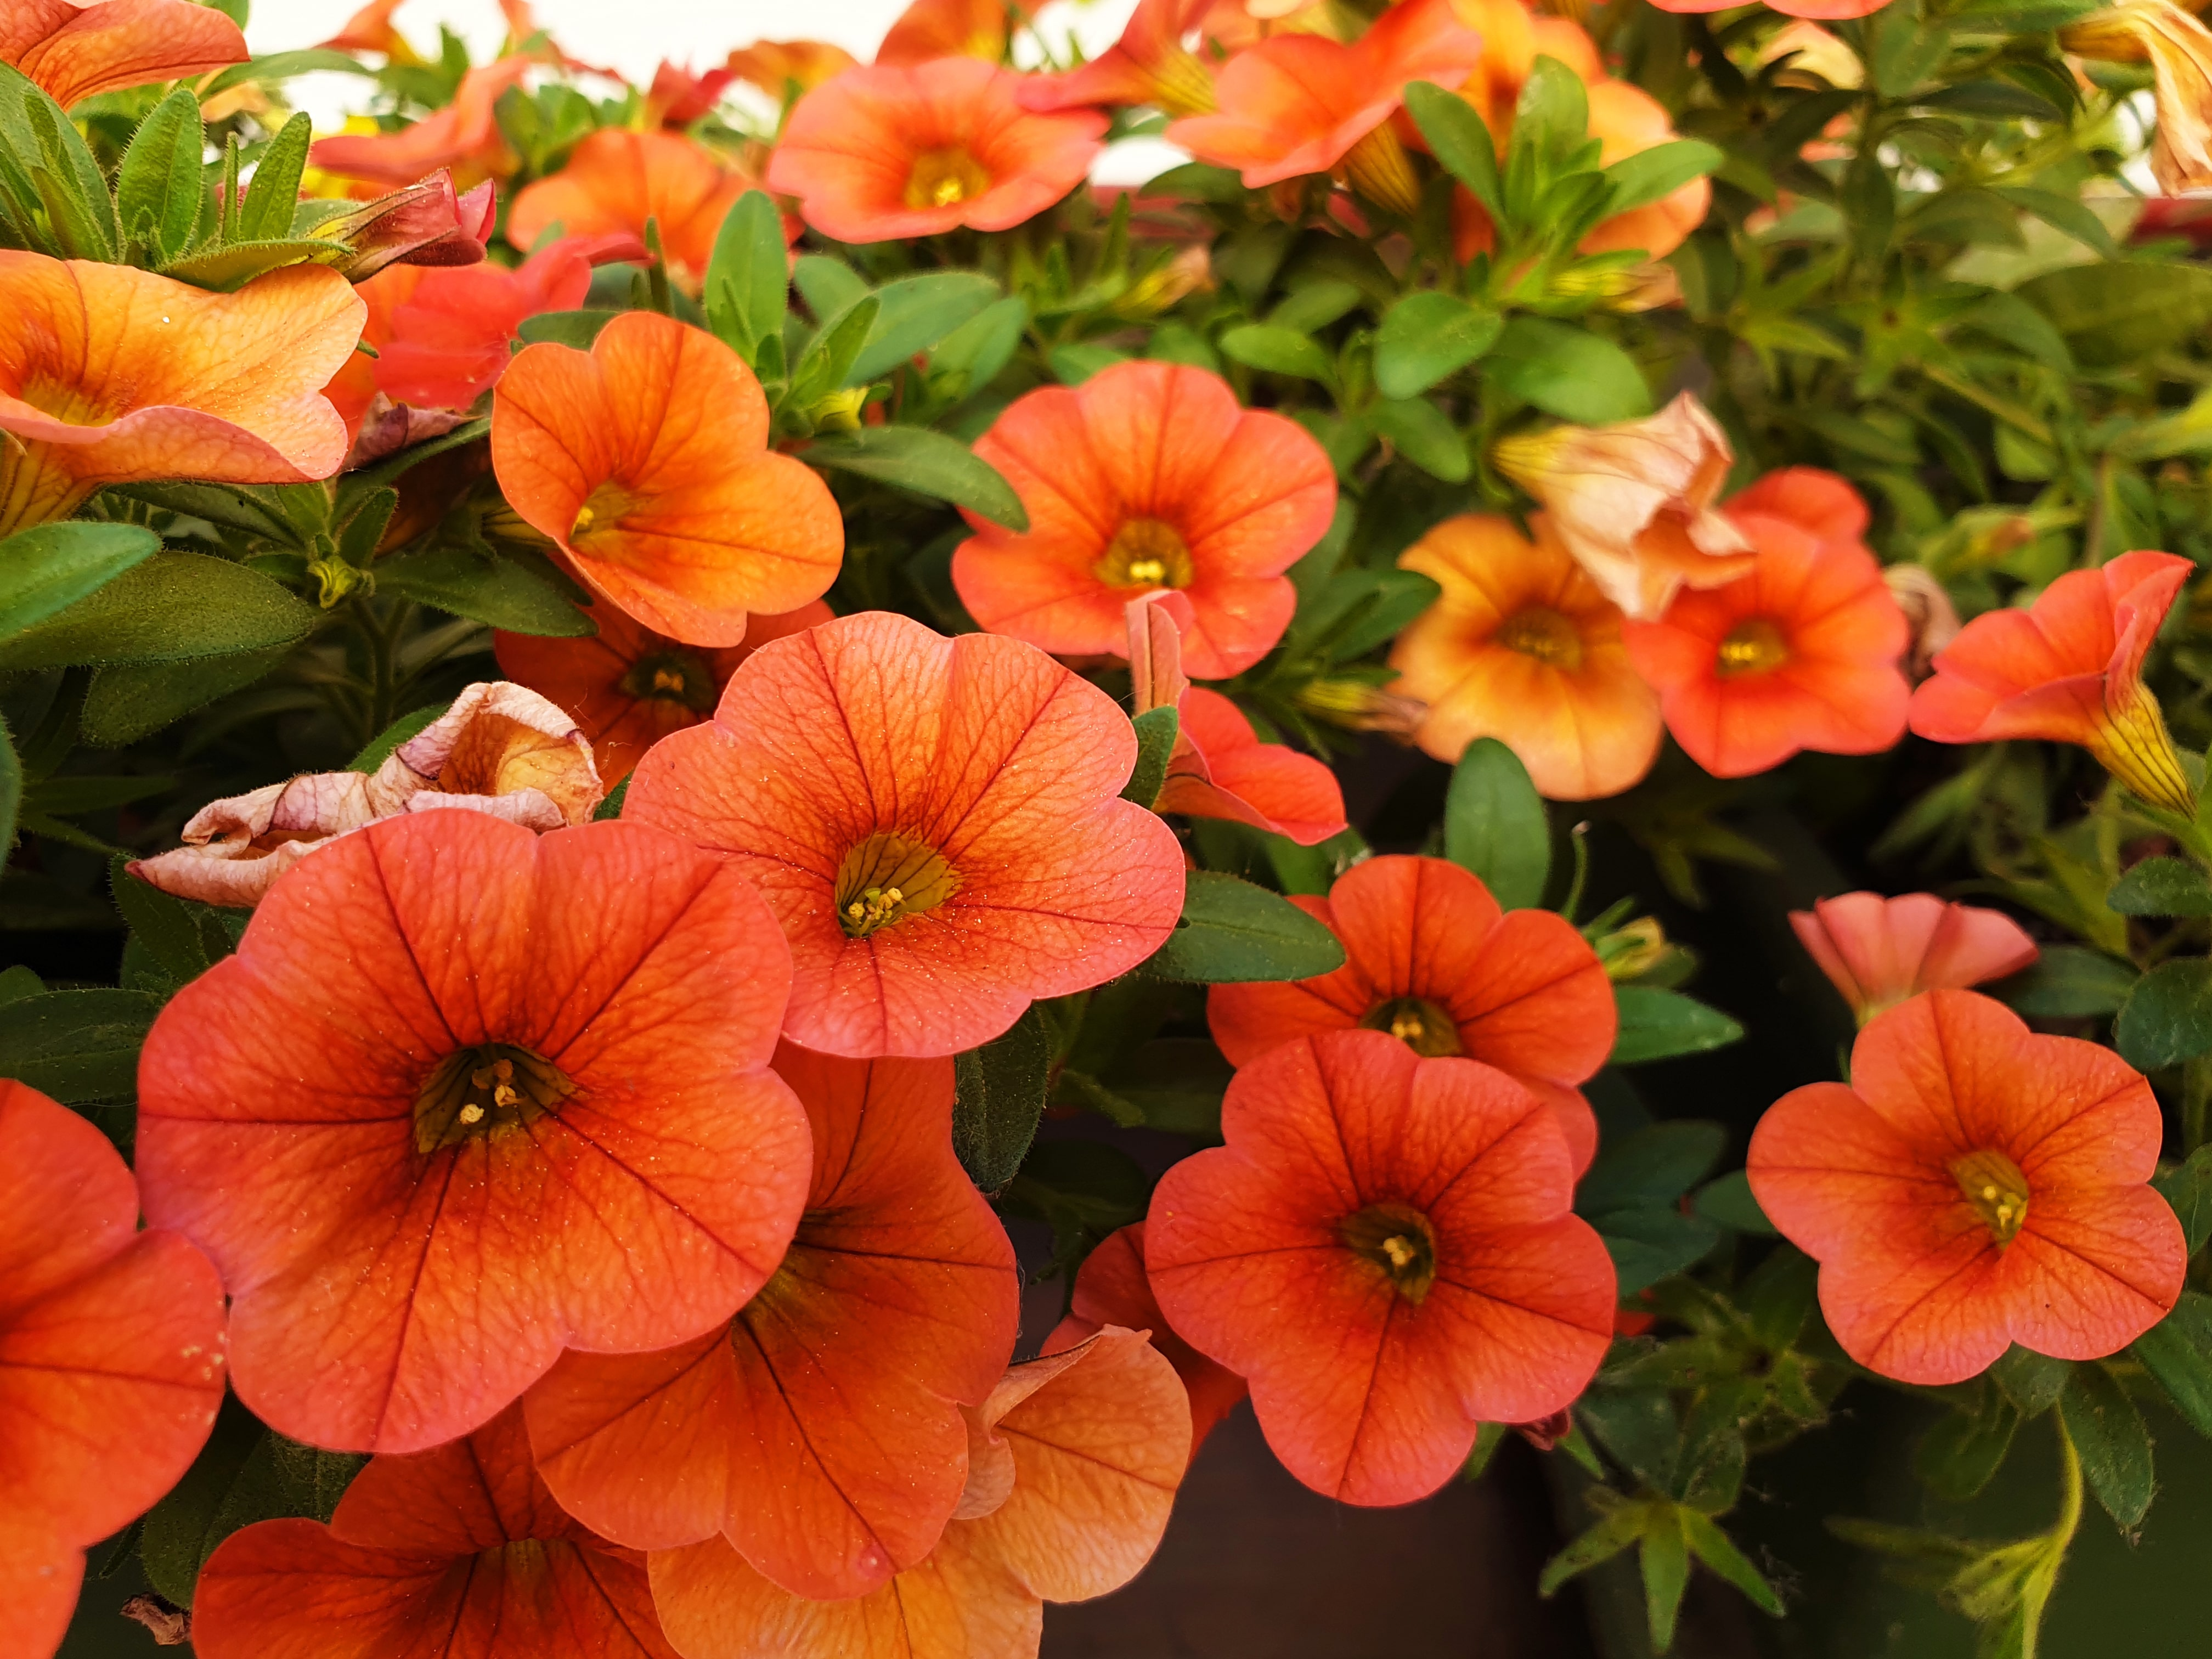 Close up of orange petunia or calibrachoa flowers.